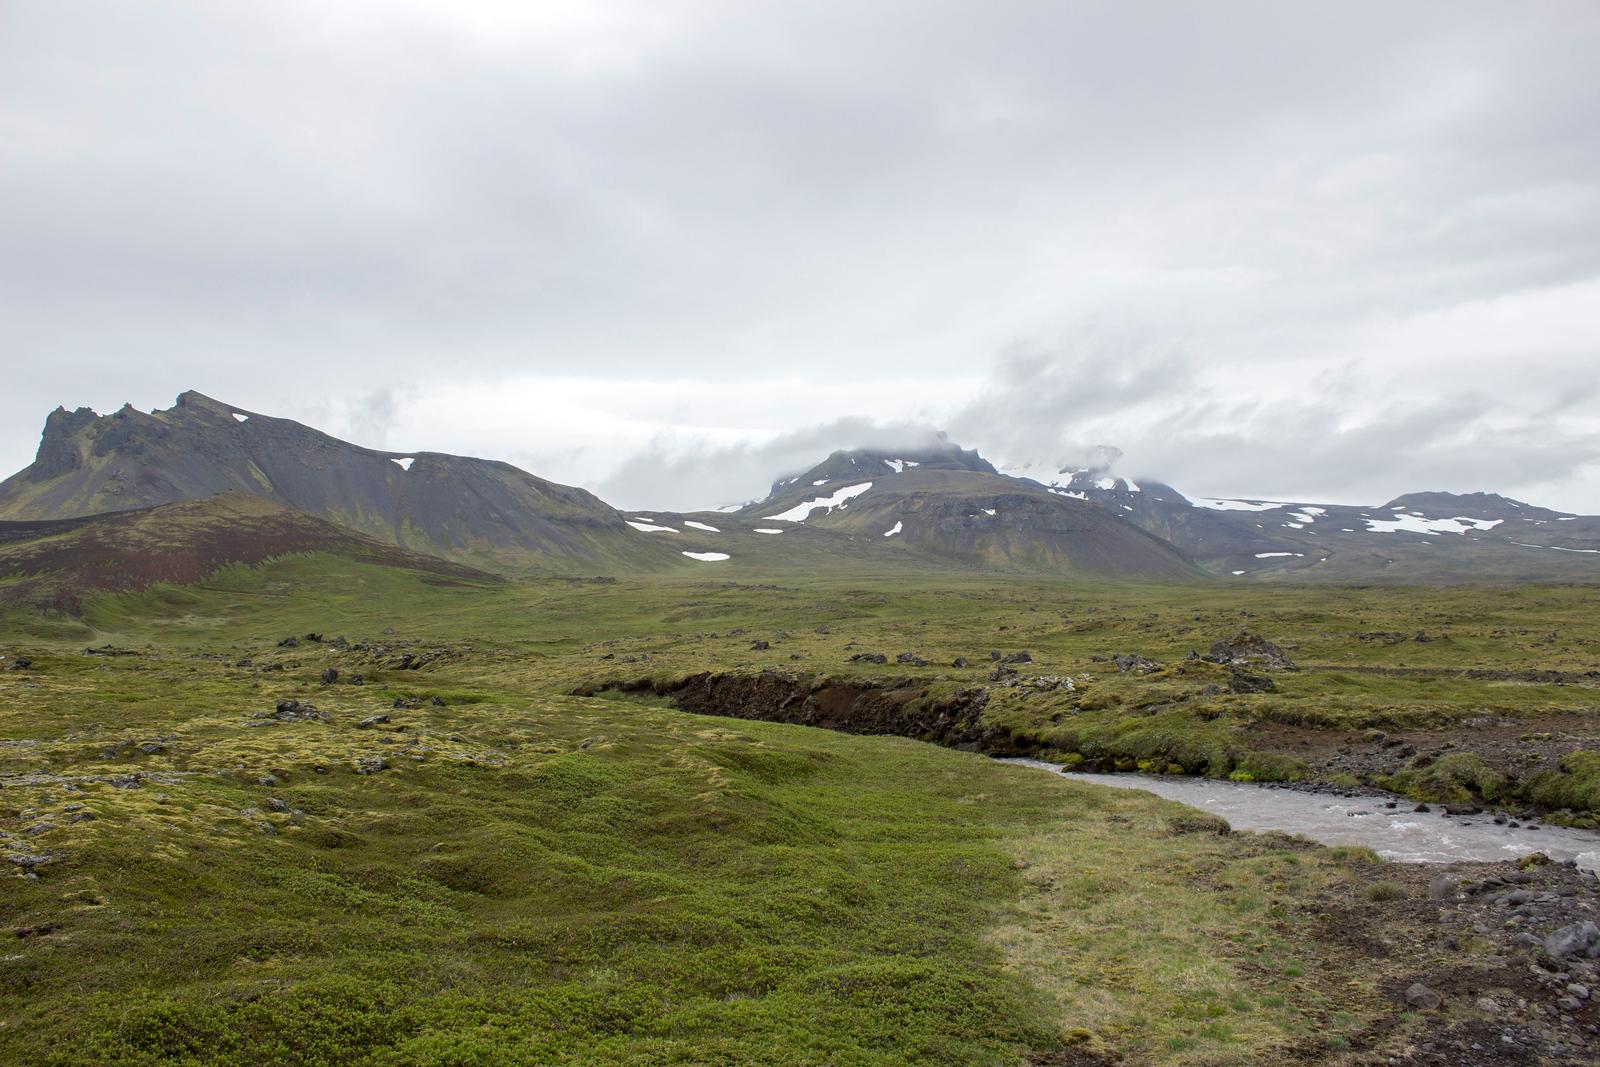 Snaefellsjokull National Park - Snæfellsnes Peninsula Iceland